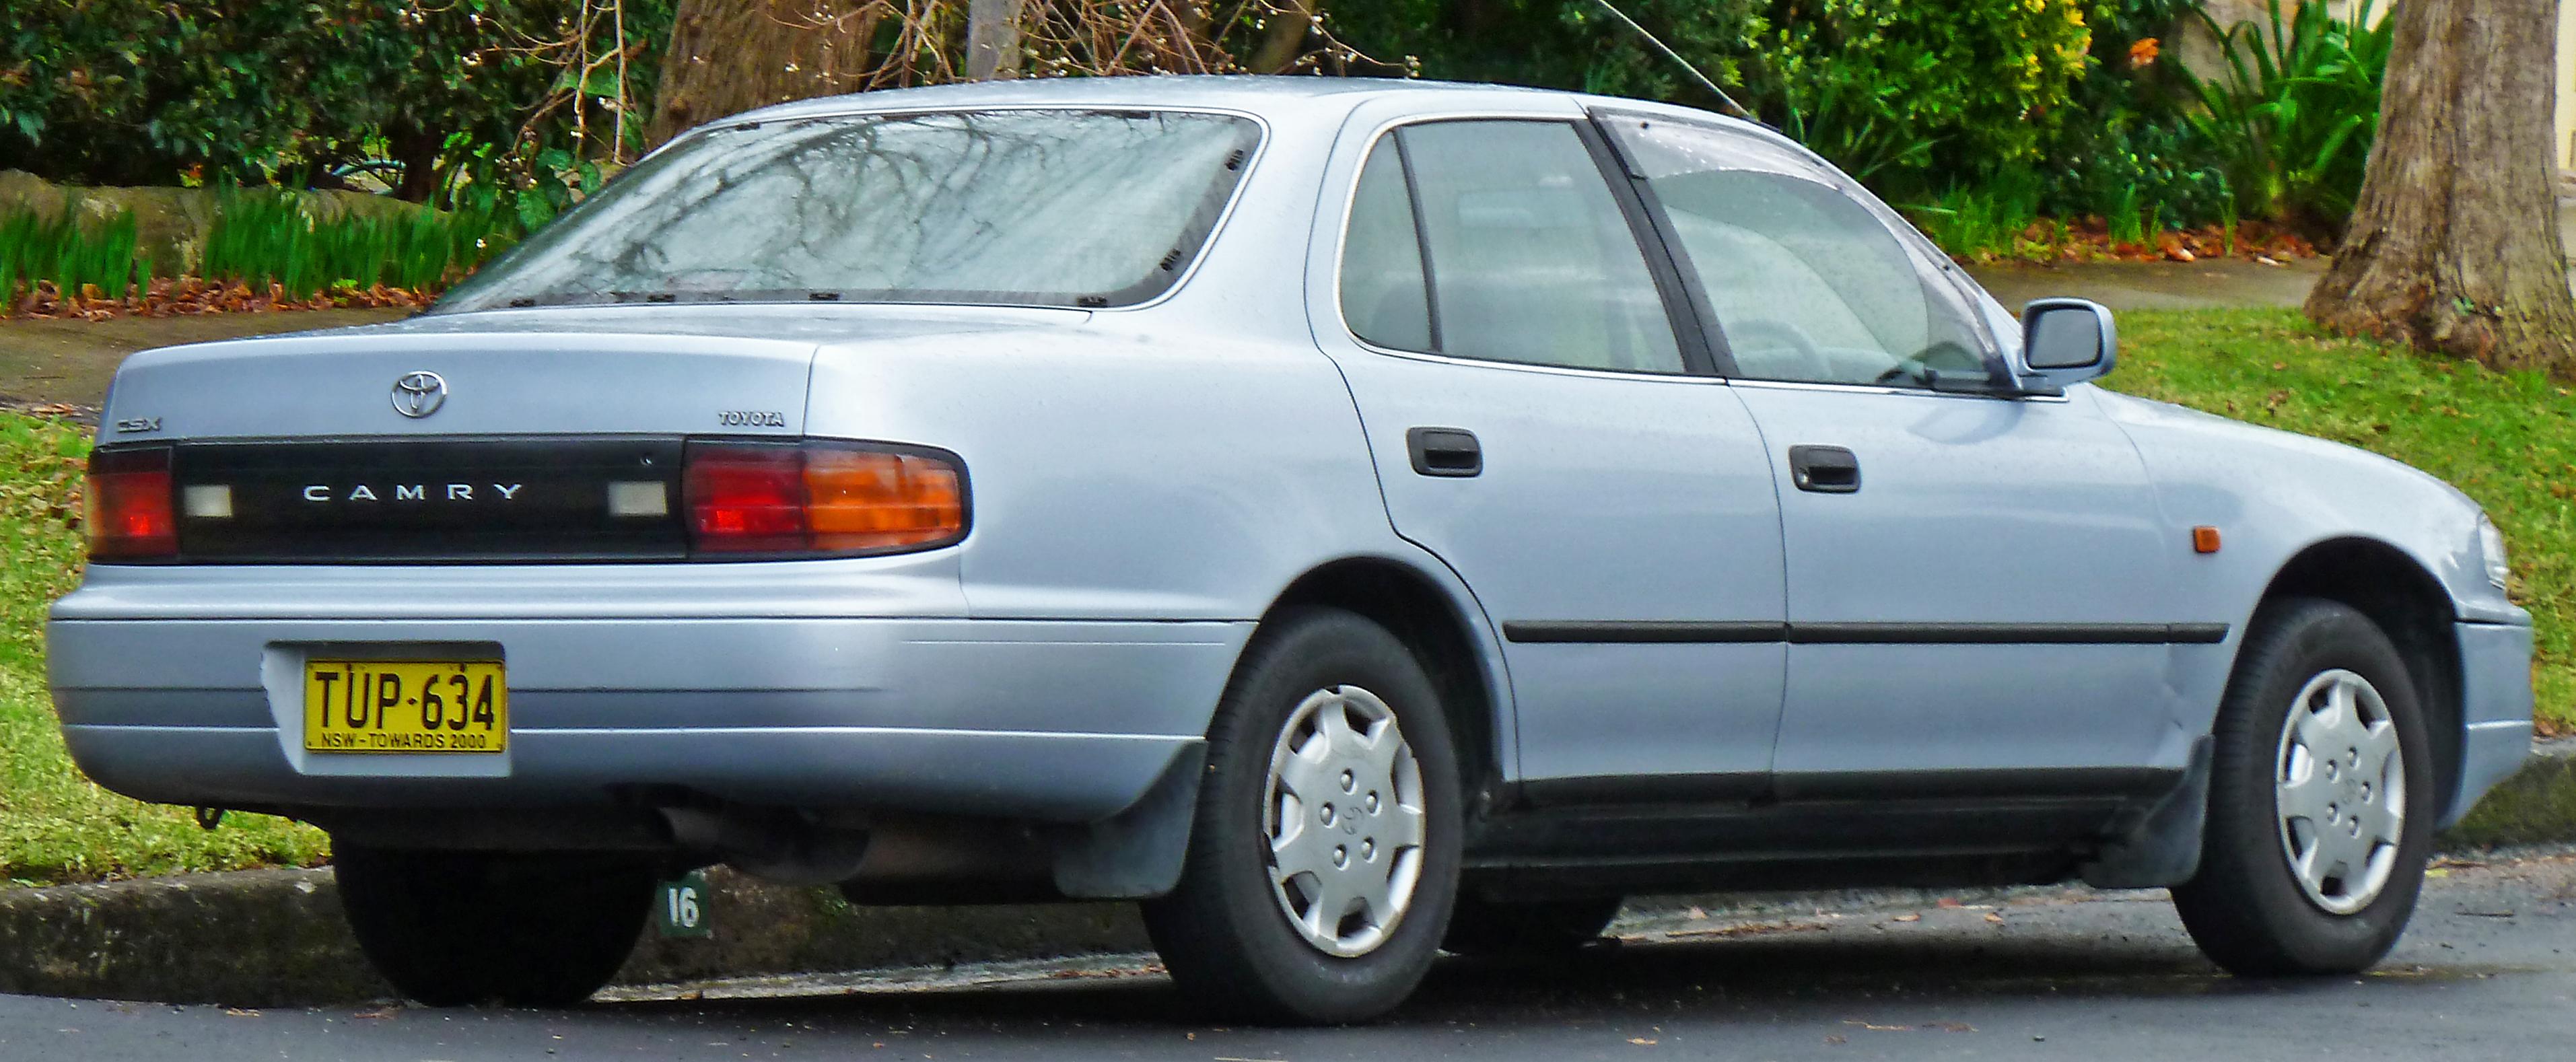 File 1994 1995 Toyota Camry Sdv10 Csx Sedan 2011 06 15